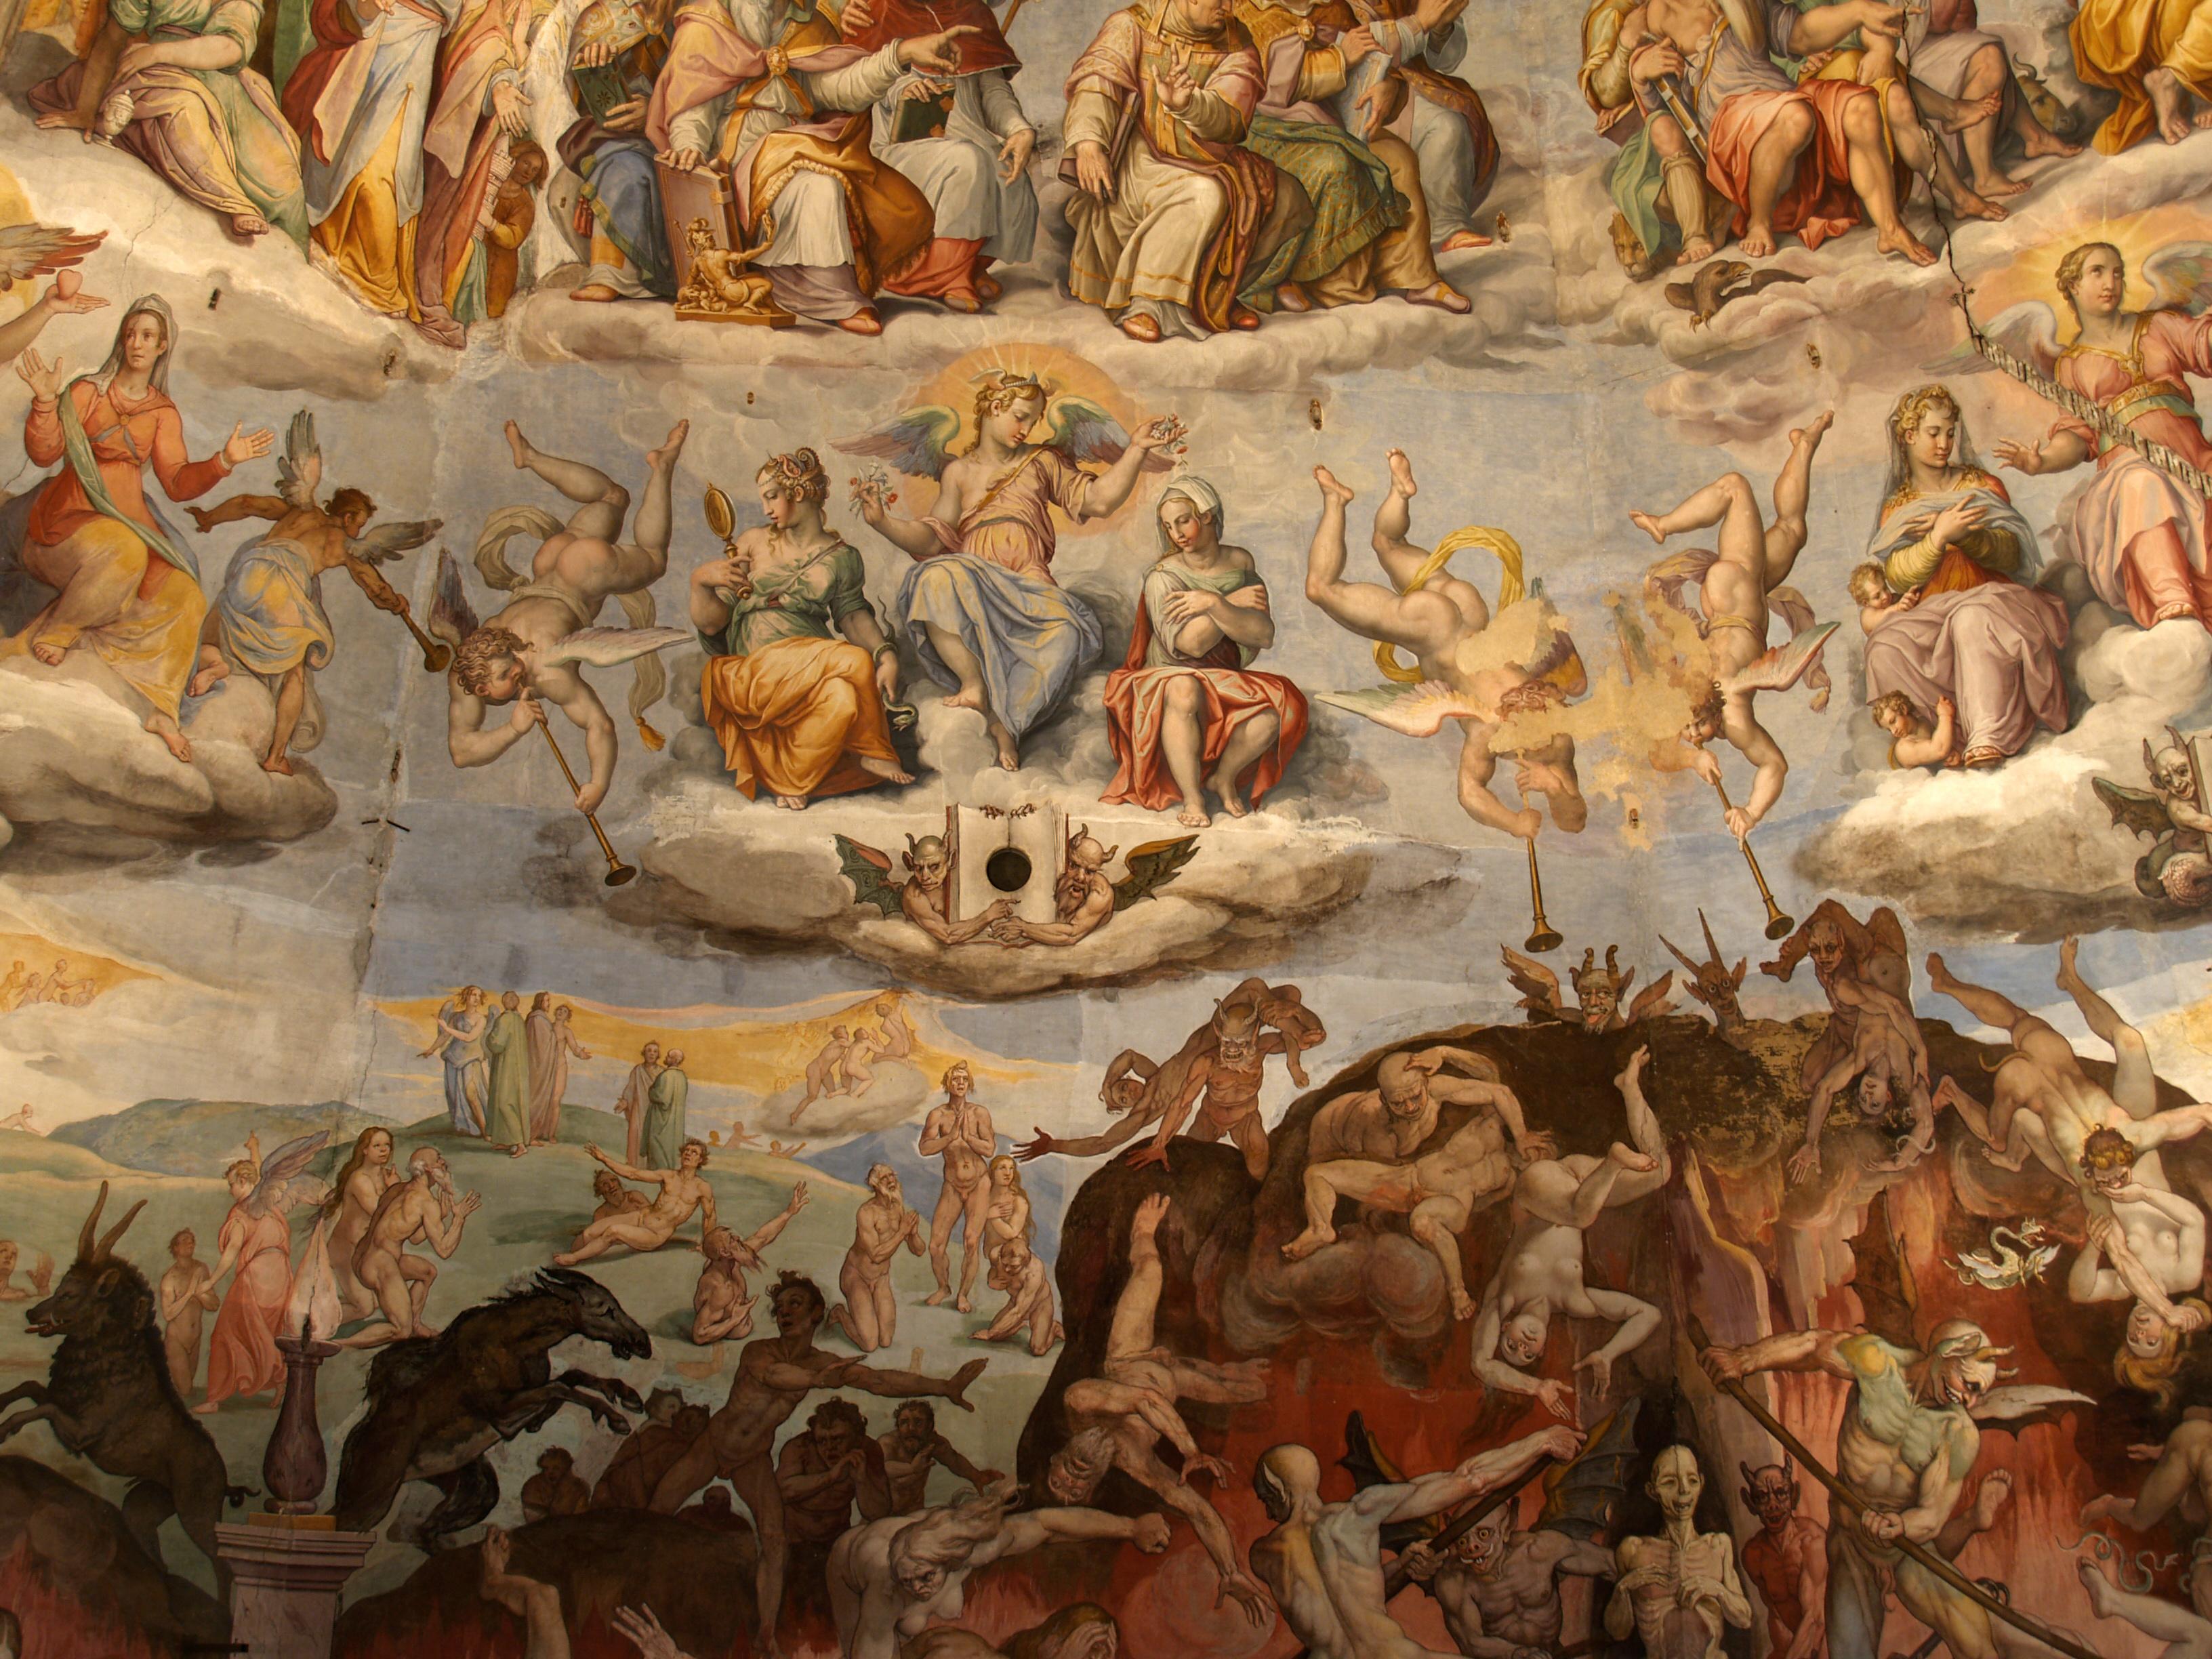 http://upload.wikimedia.org/wikipedia/commons/6/60/Santa_Maria_del_Fiore_cupola_fresco_detail.jpg